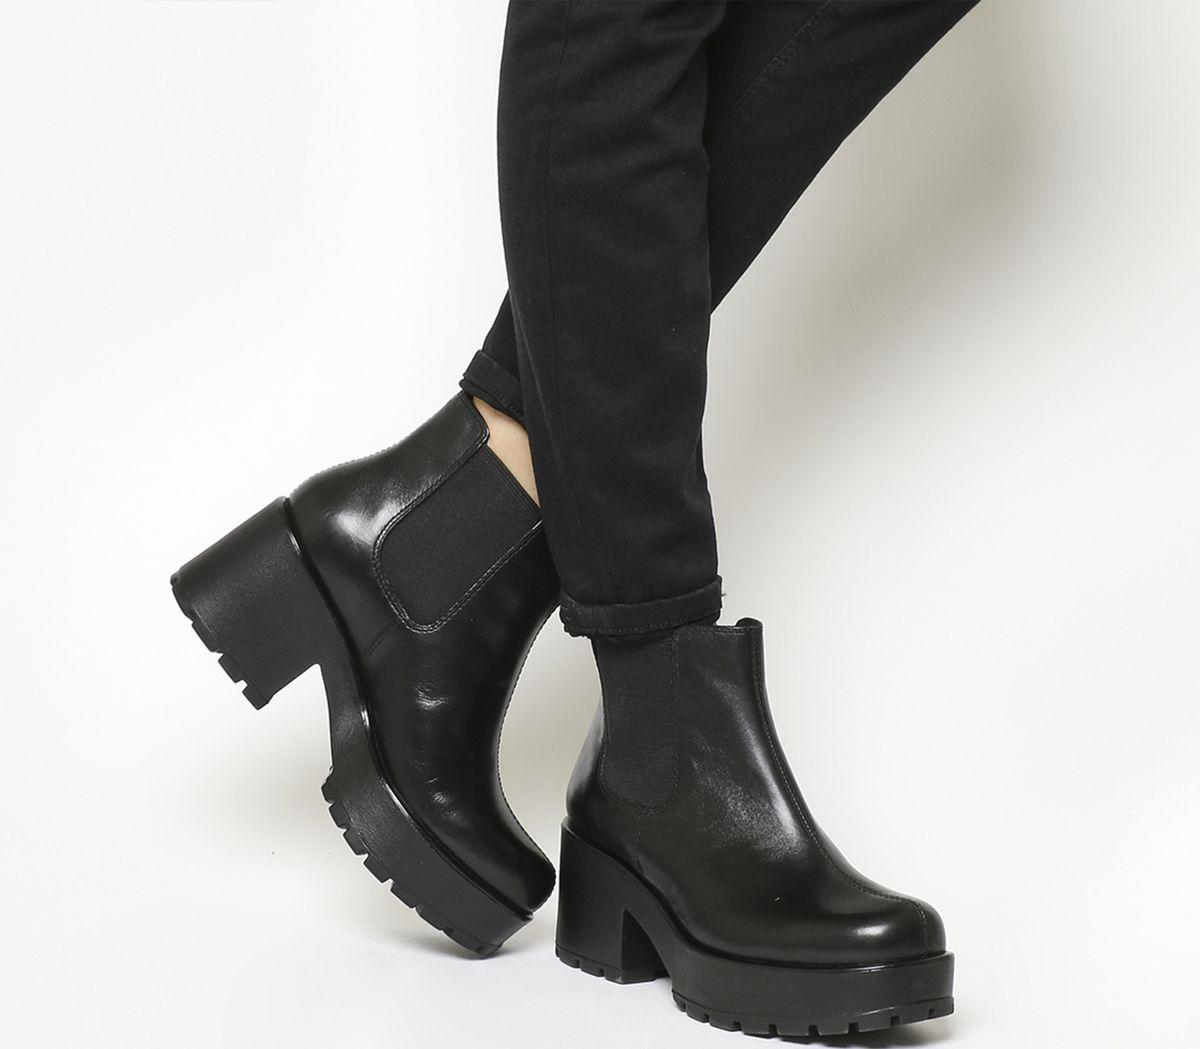 d5a91a09153 Vagabond Dioon Elastic Chelsea Boots Exclusive Black Leather - Ankle ...